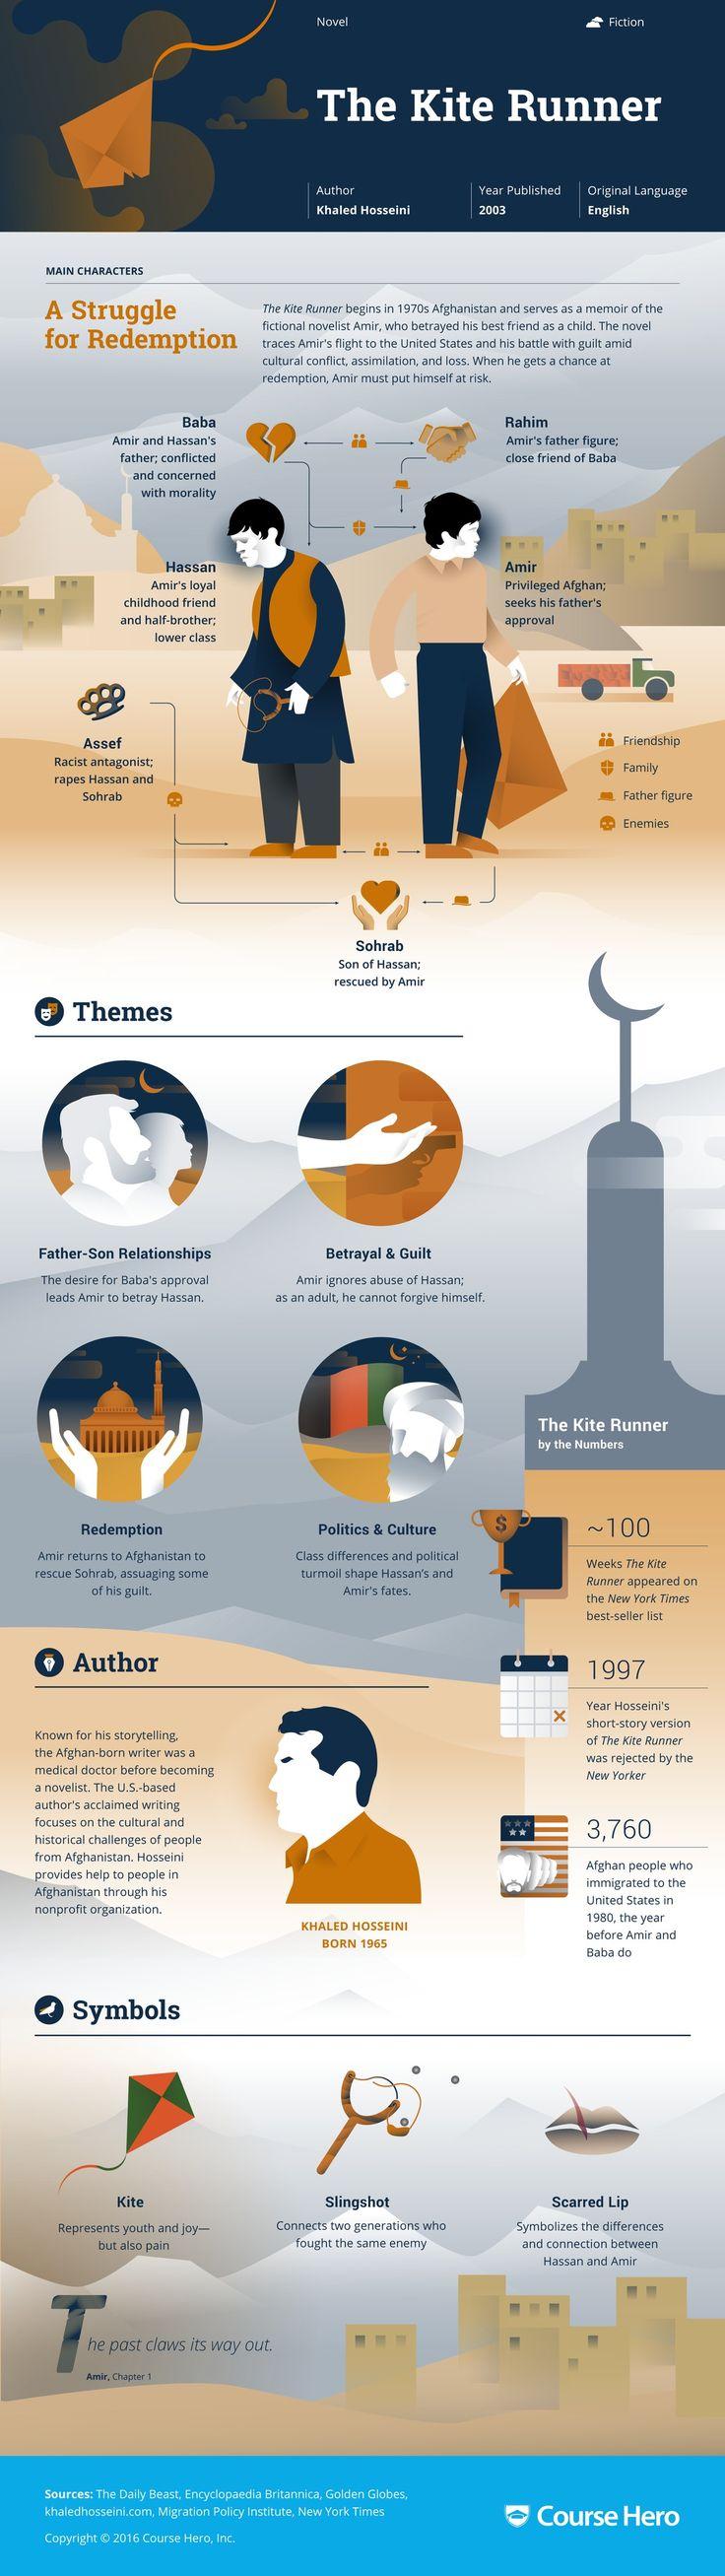 The Kite Runner Infographic | Course Hero